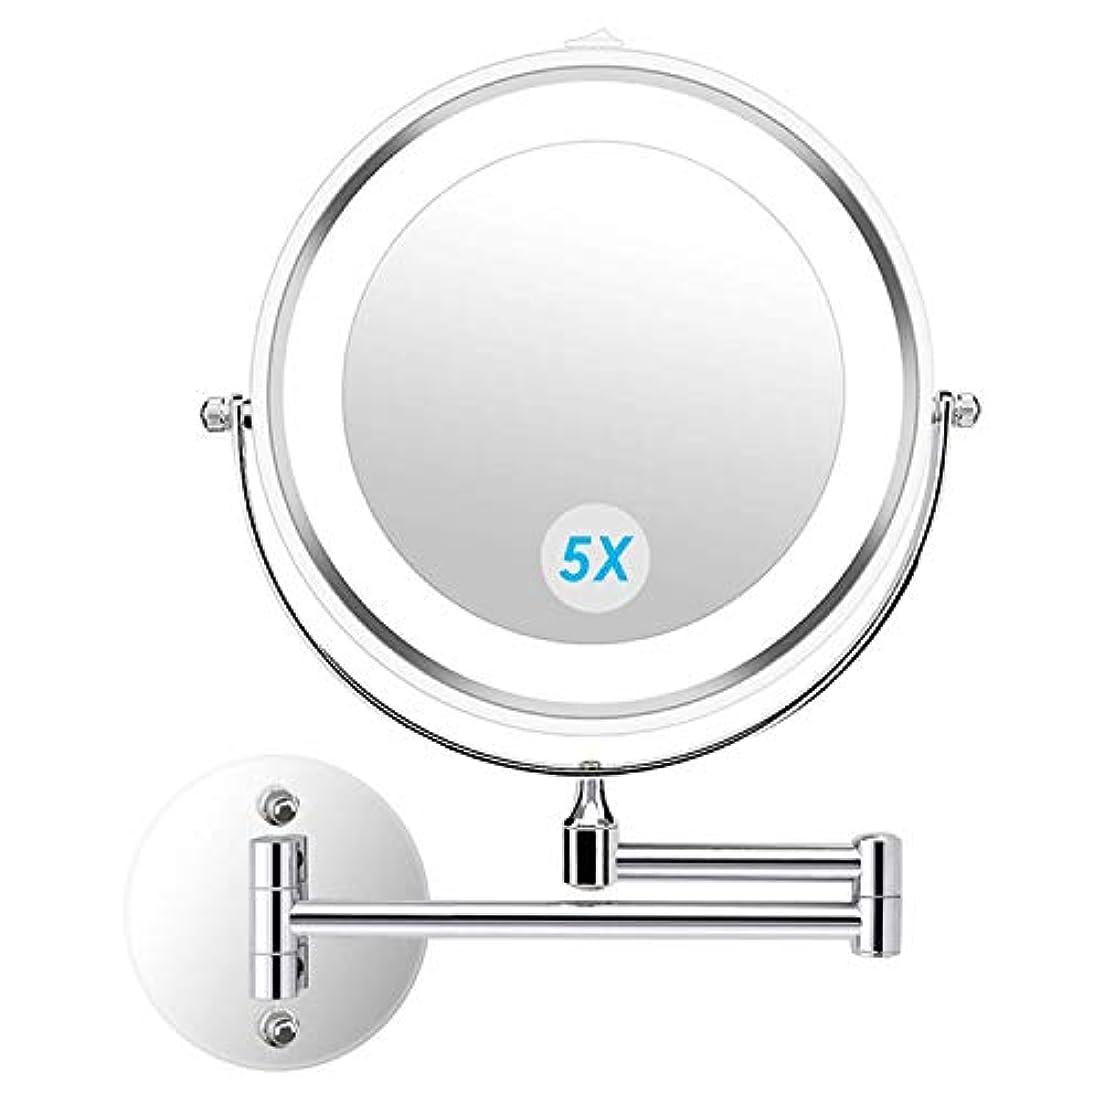 alvorog 壁掛け化粧鏡 4個 電池で駆動バスルームホテル用照明付き両面5倍 倍率360度 スイベル延長化粧化粧鏡を導きました 7